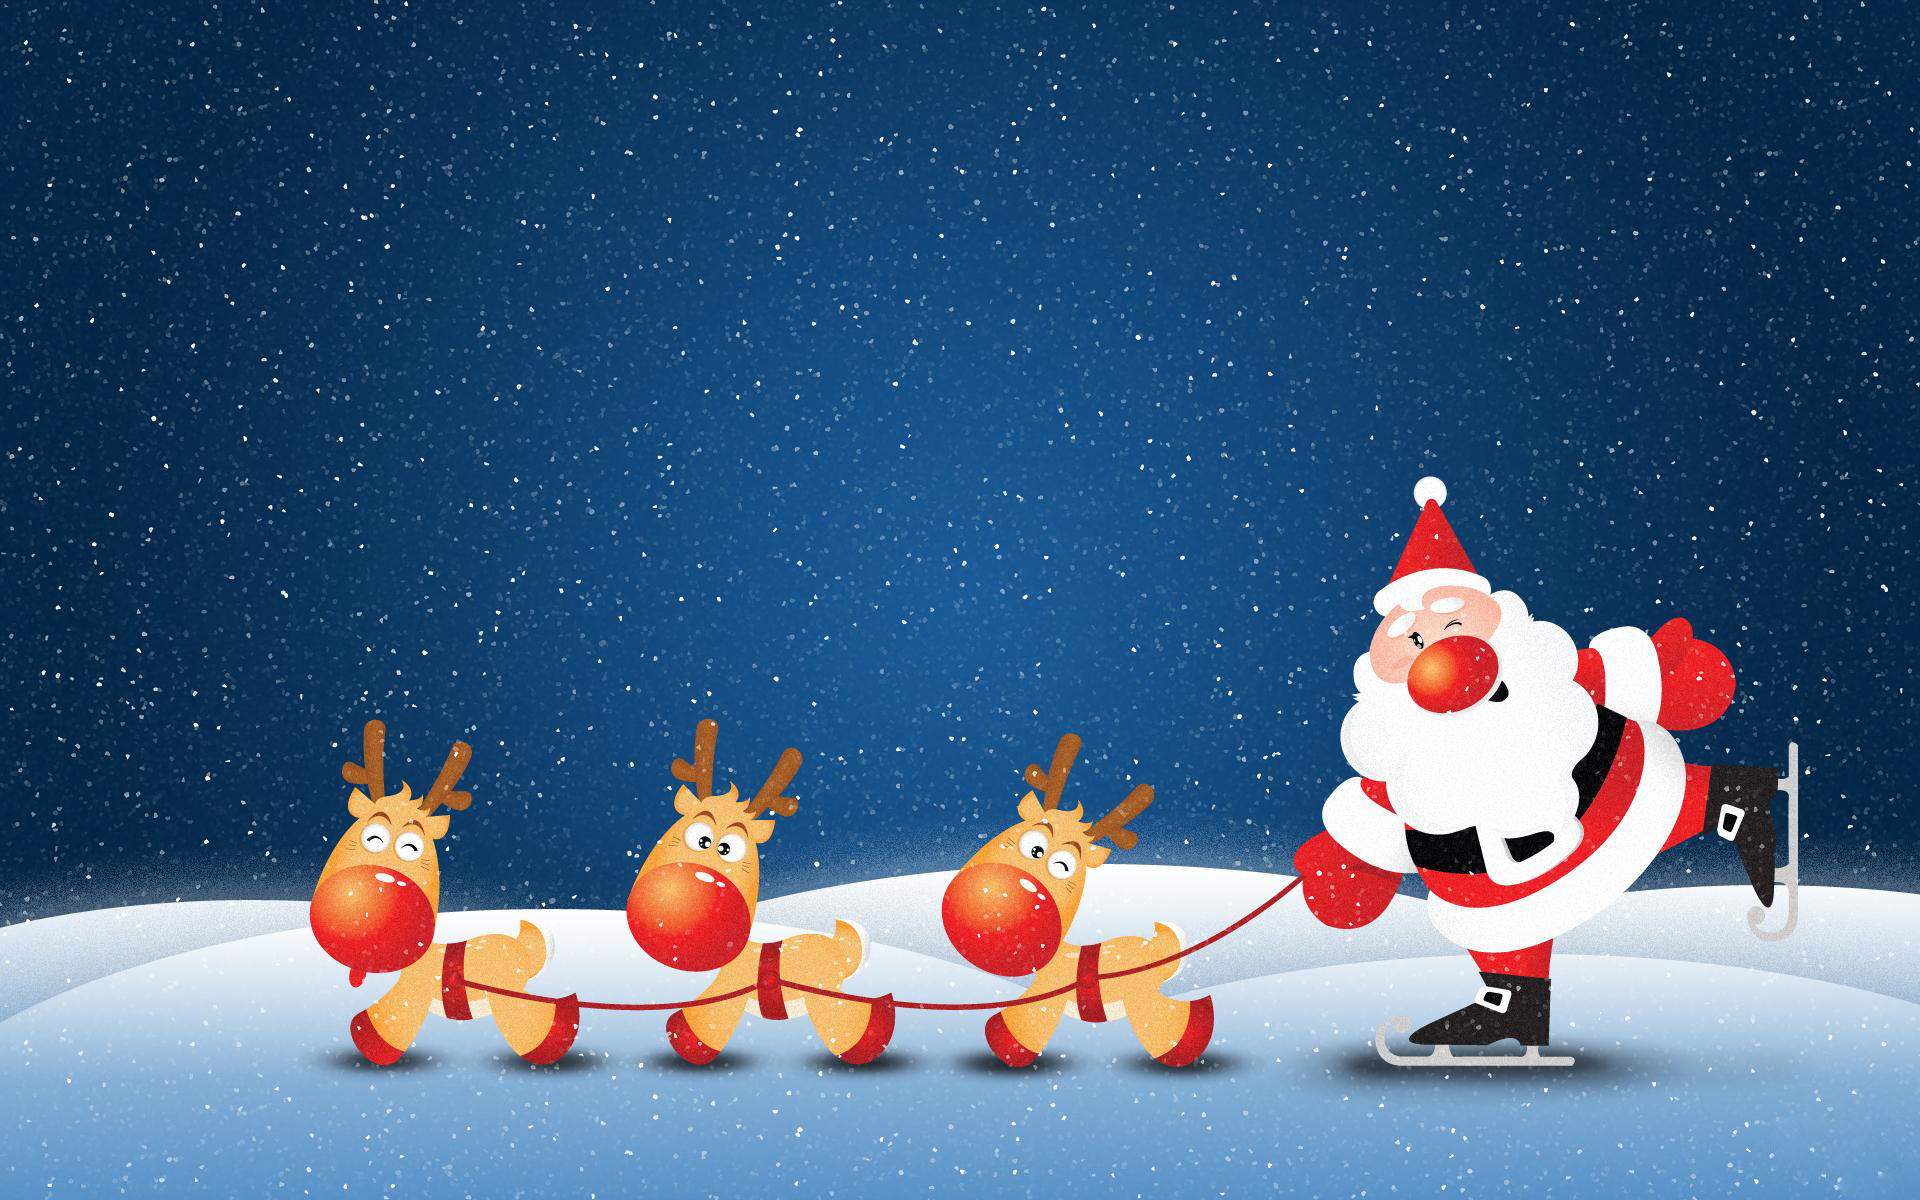 Res: 1920x1200, Funny Christmas Santa Wallpaper.